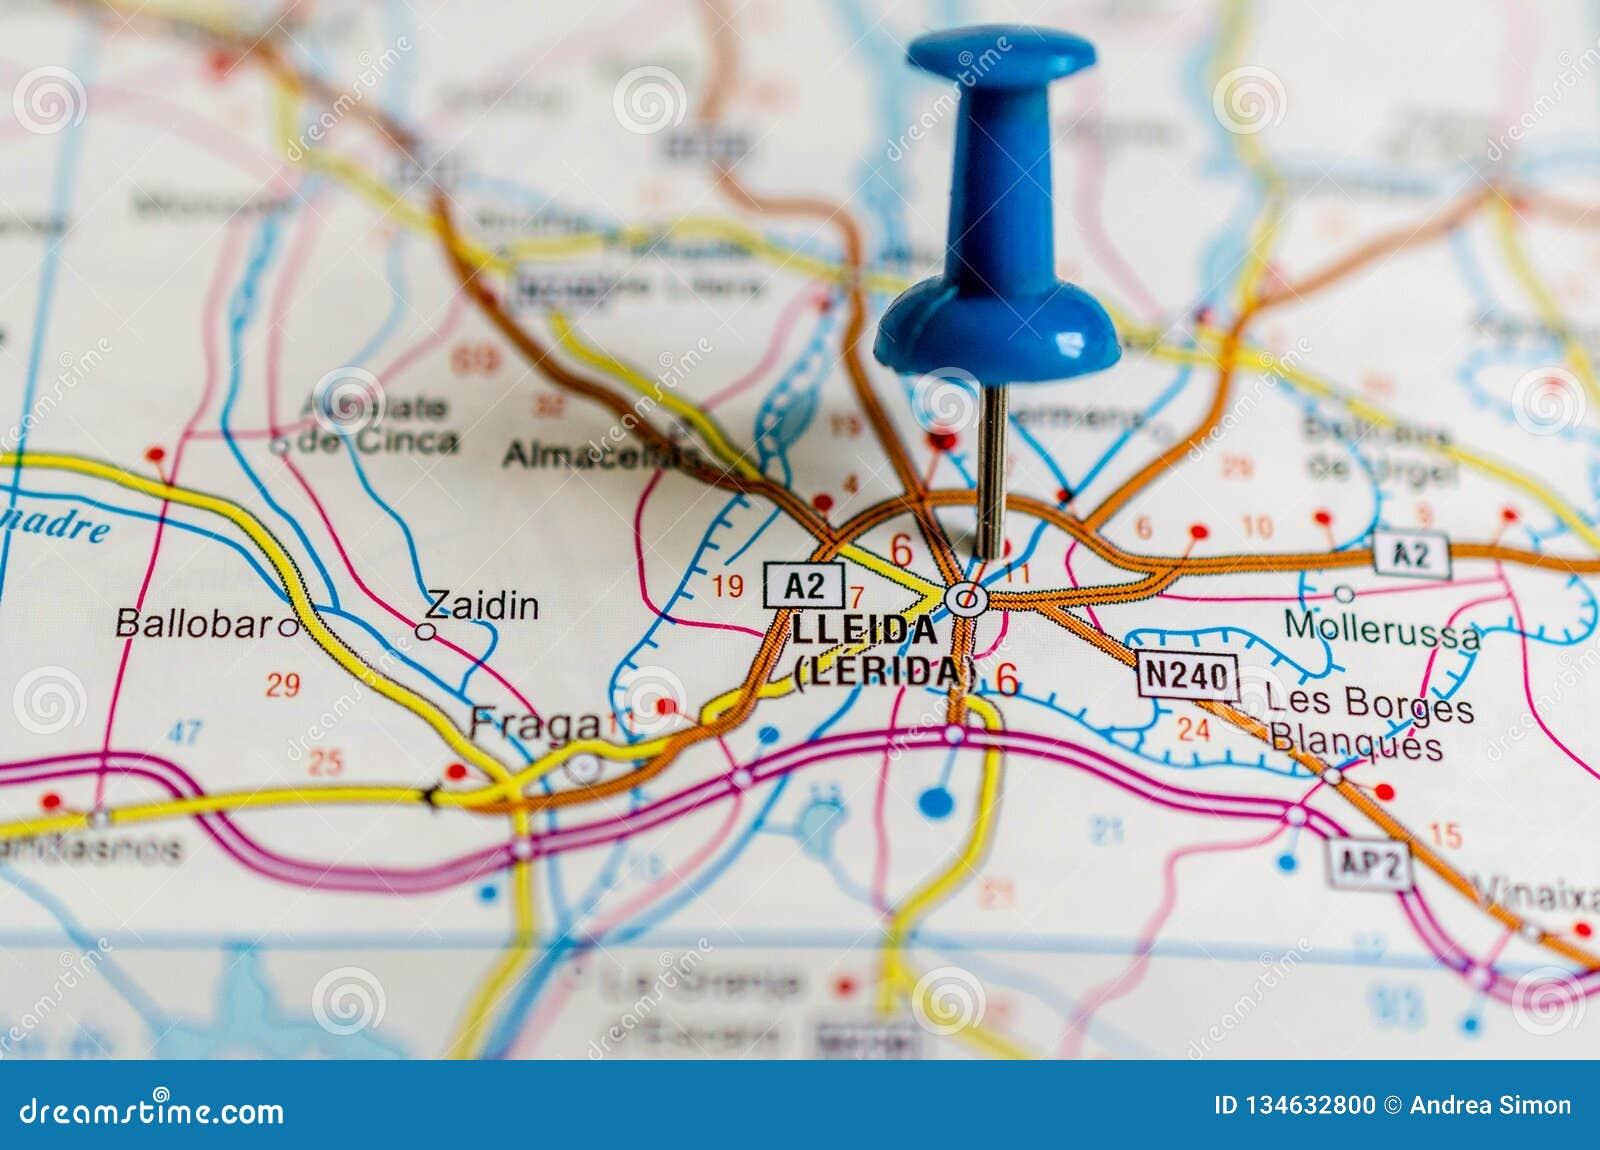 Lleida On Map Stock Photo Image Of Highway Europe 134632800